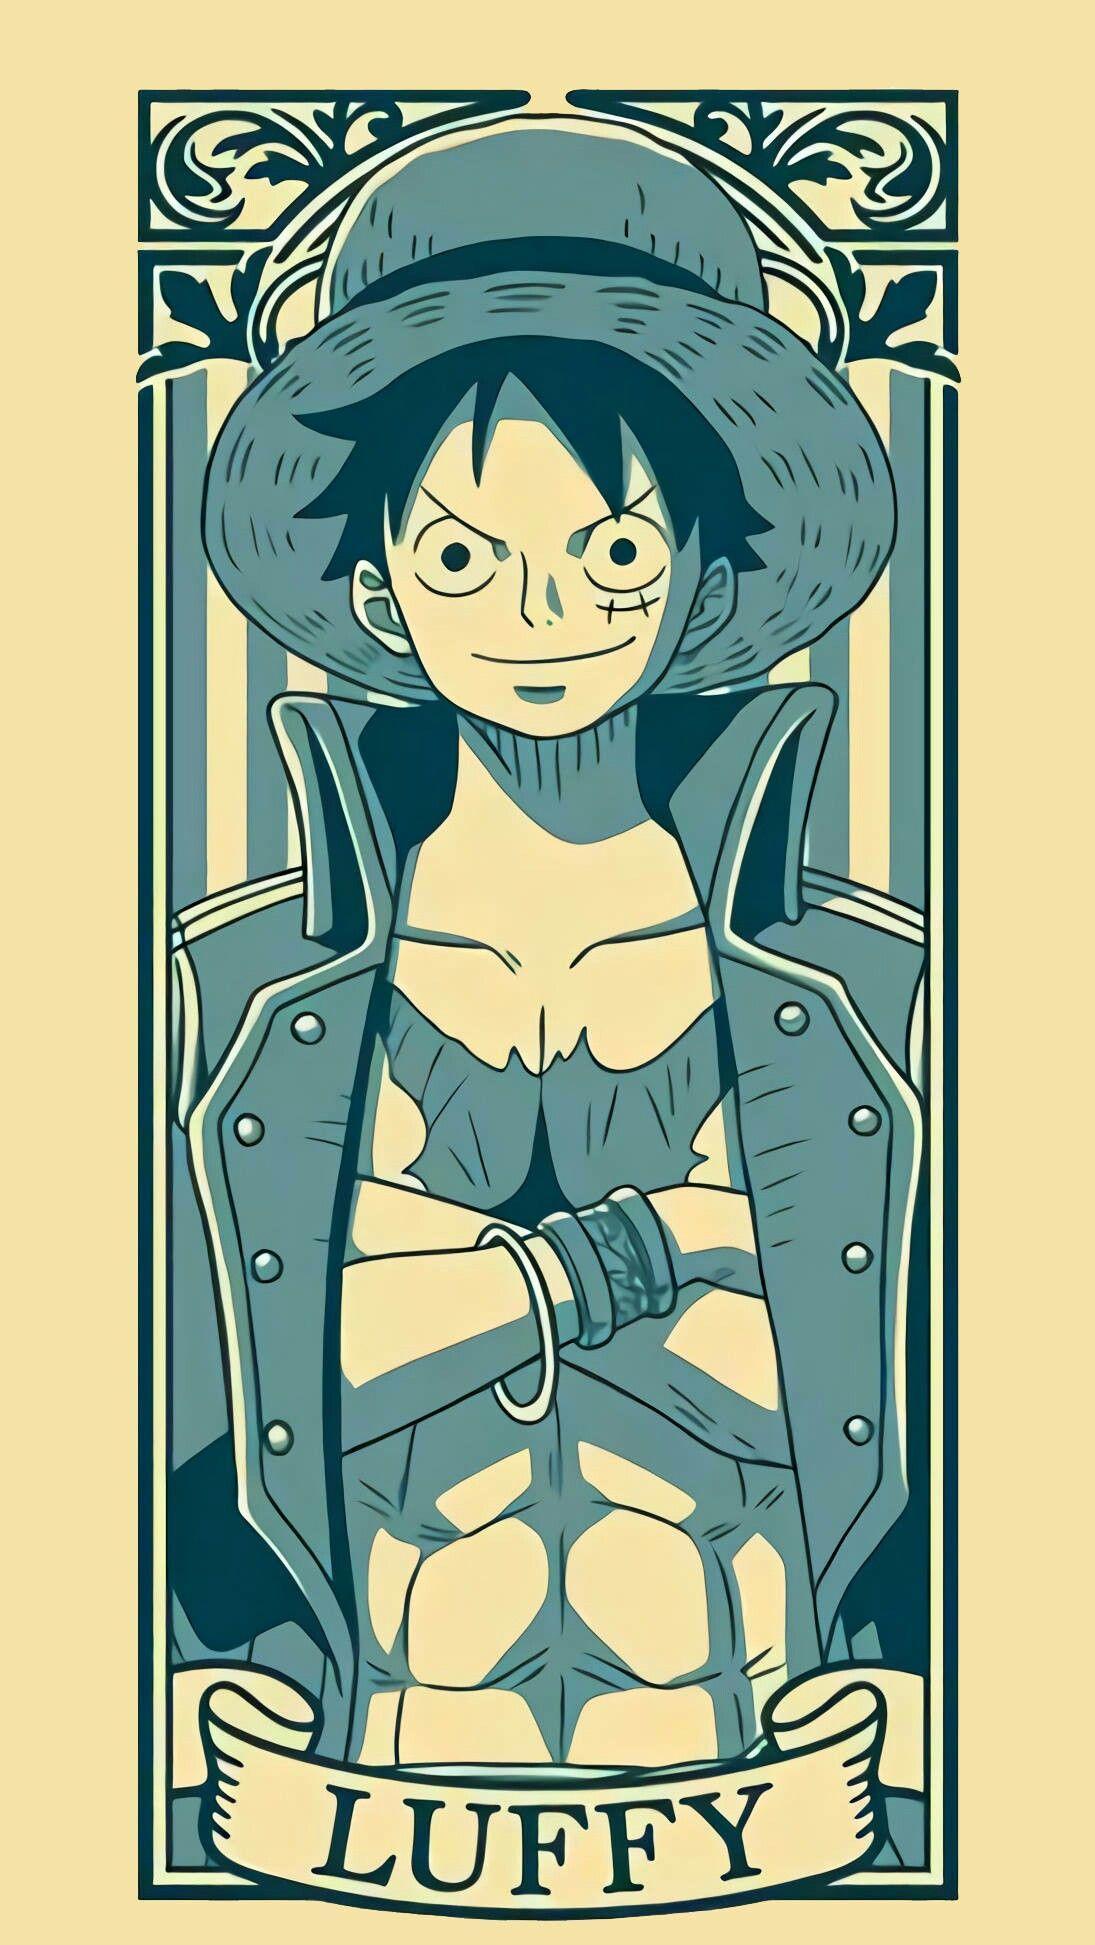 03 Luffy One pièce manga, Dessin manga, Dessin animé